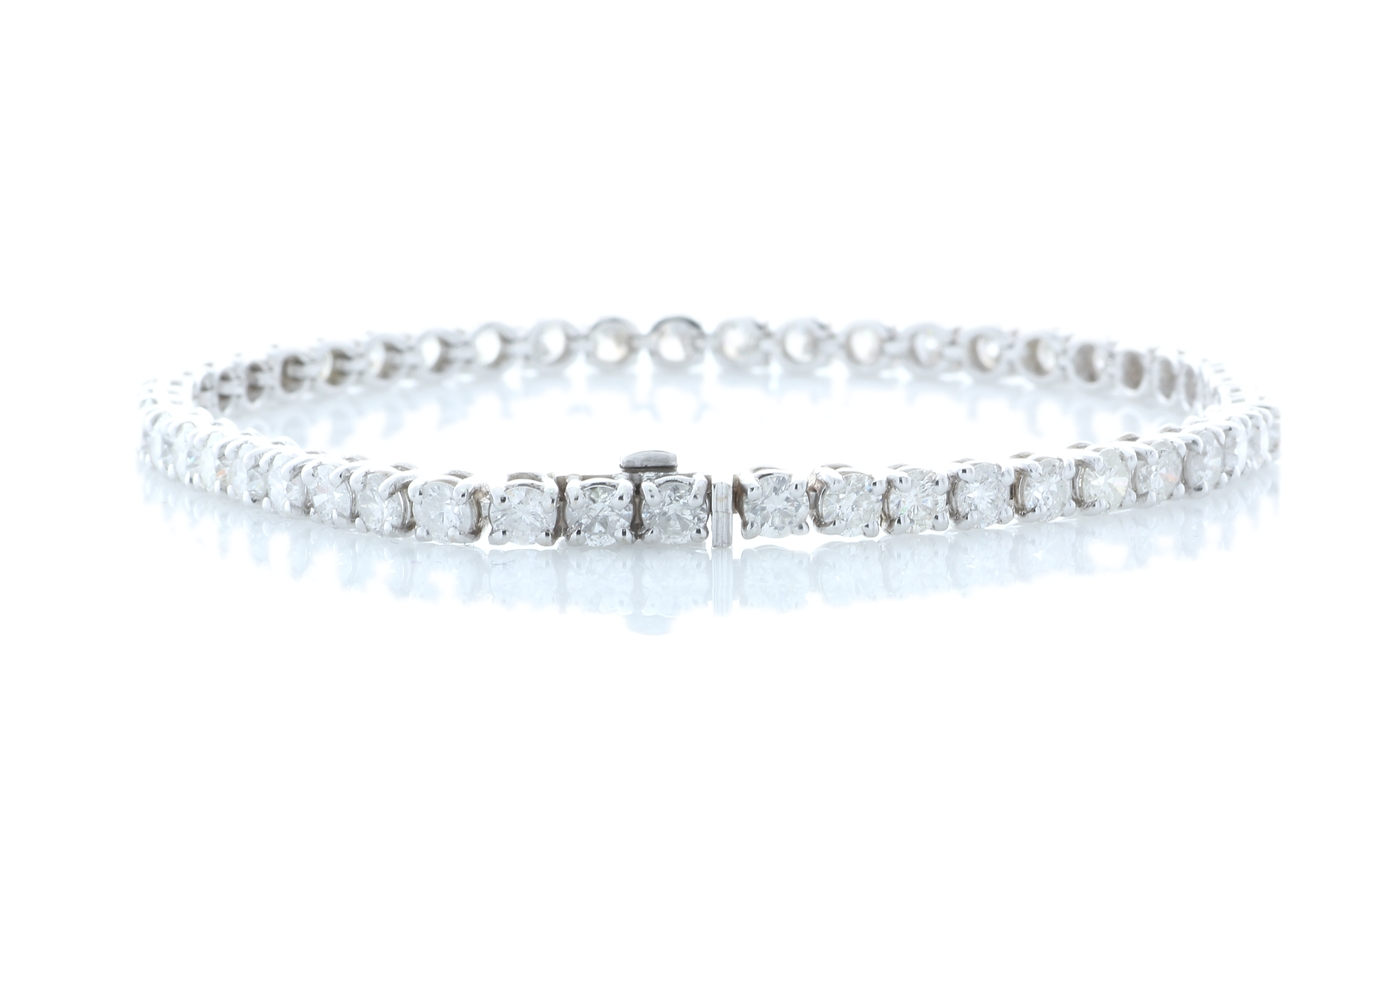 Lot 38 - 18ct White Gold Tennis Diamond Bracelet 7.67 Carats